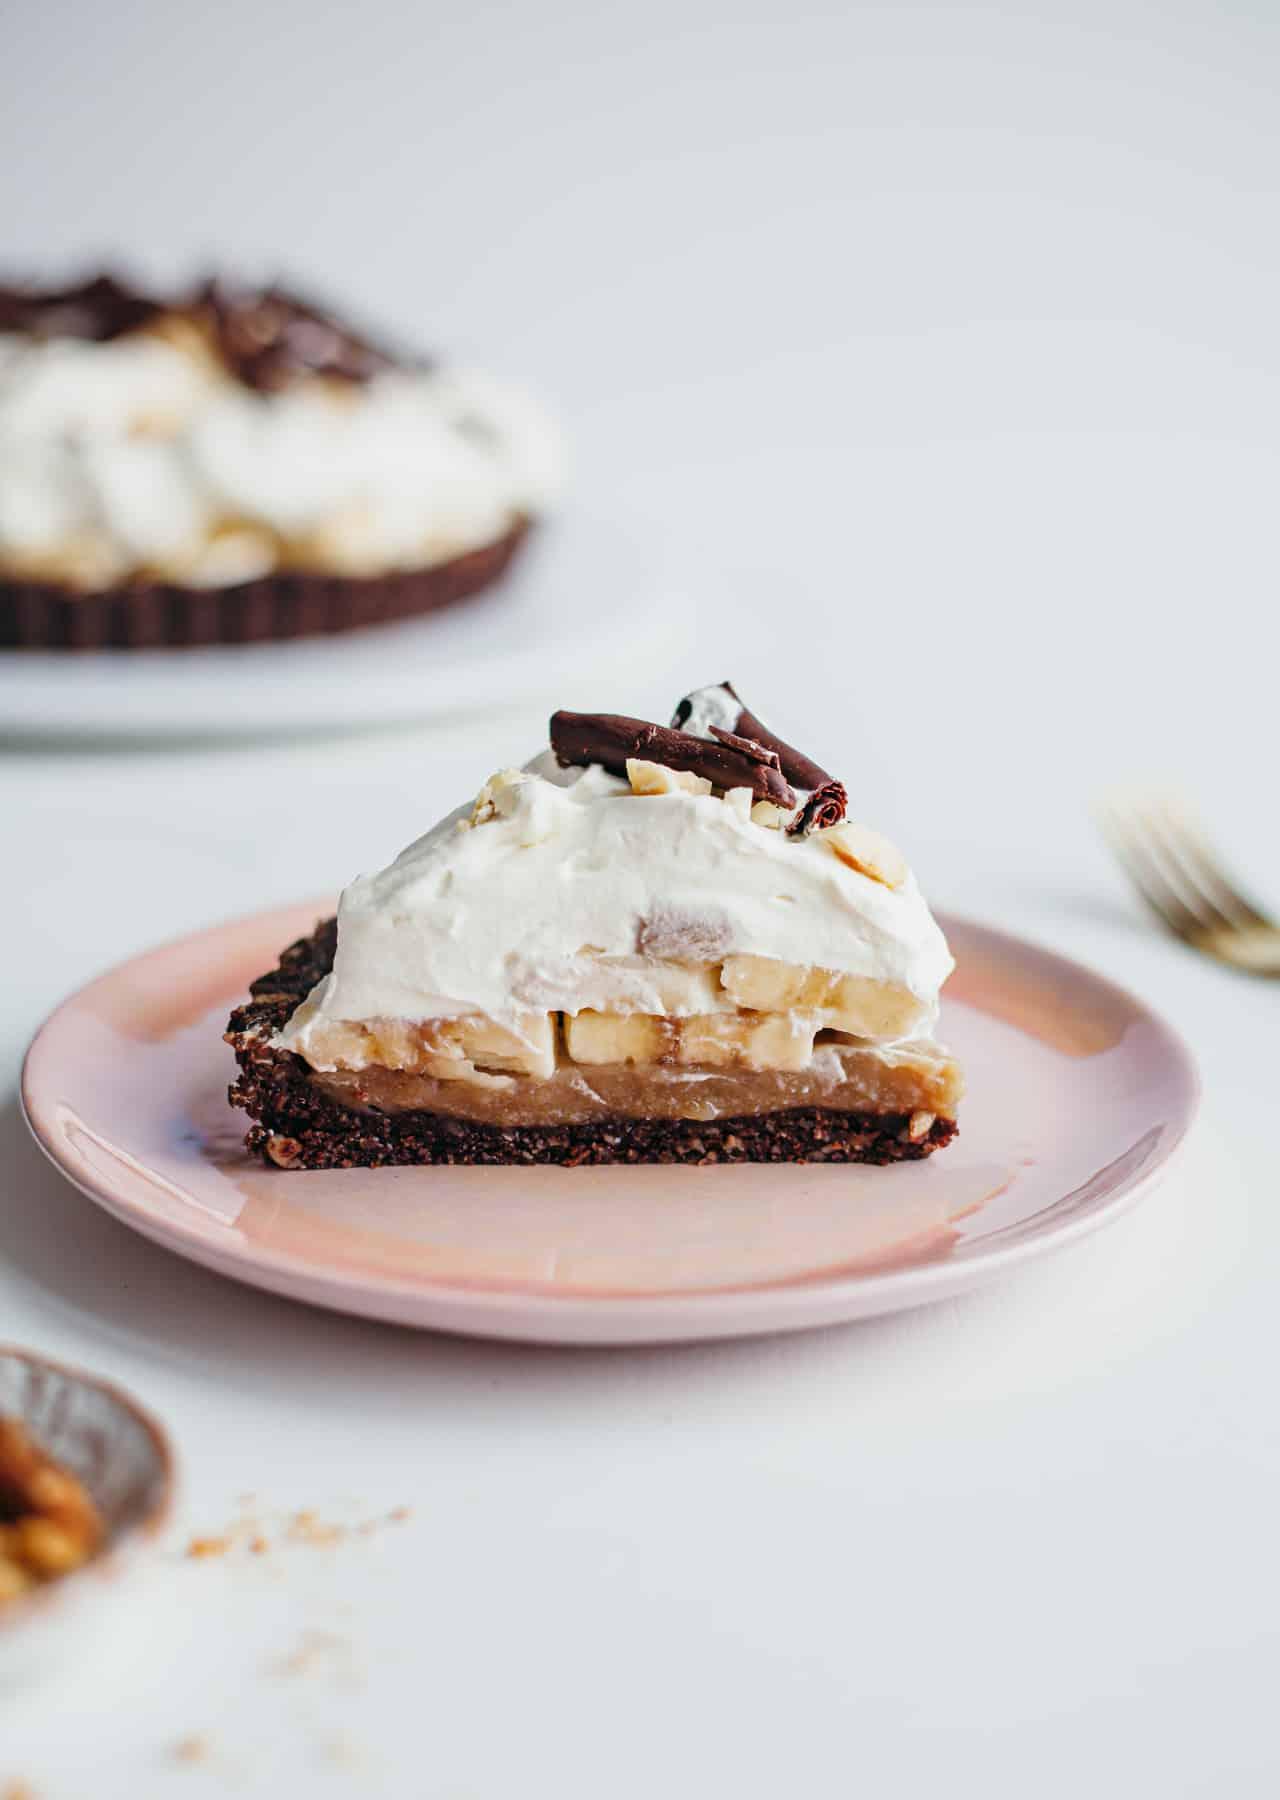 Chocolate & Hazelnut Banoffee Pie Vegan Recipe